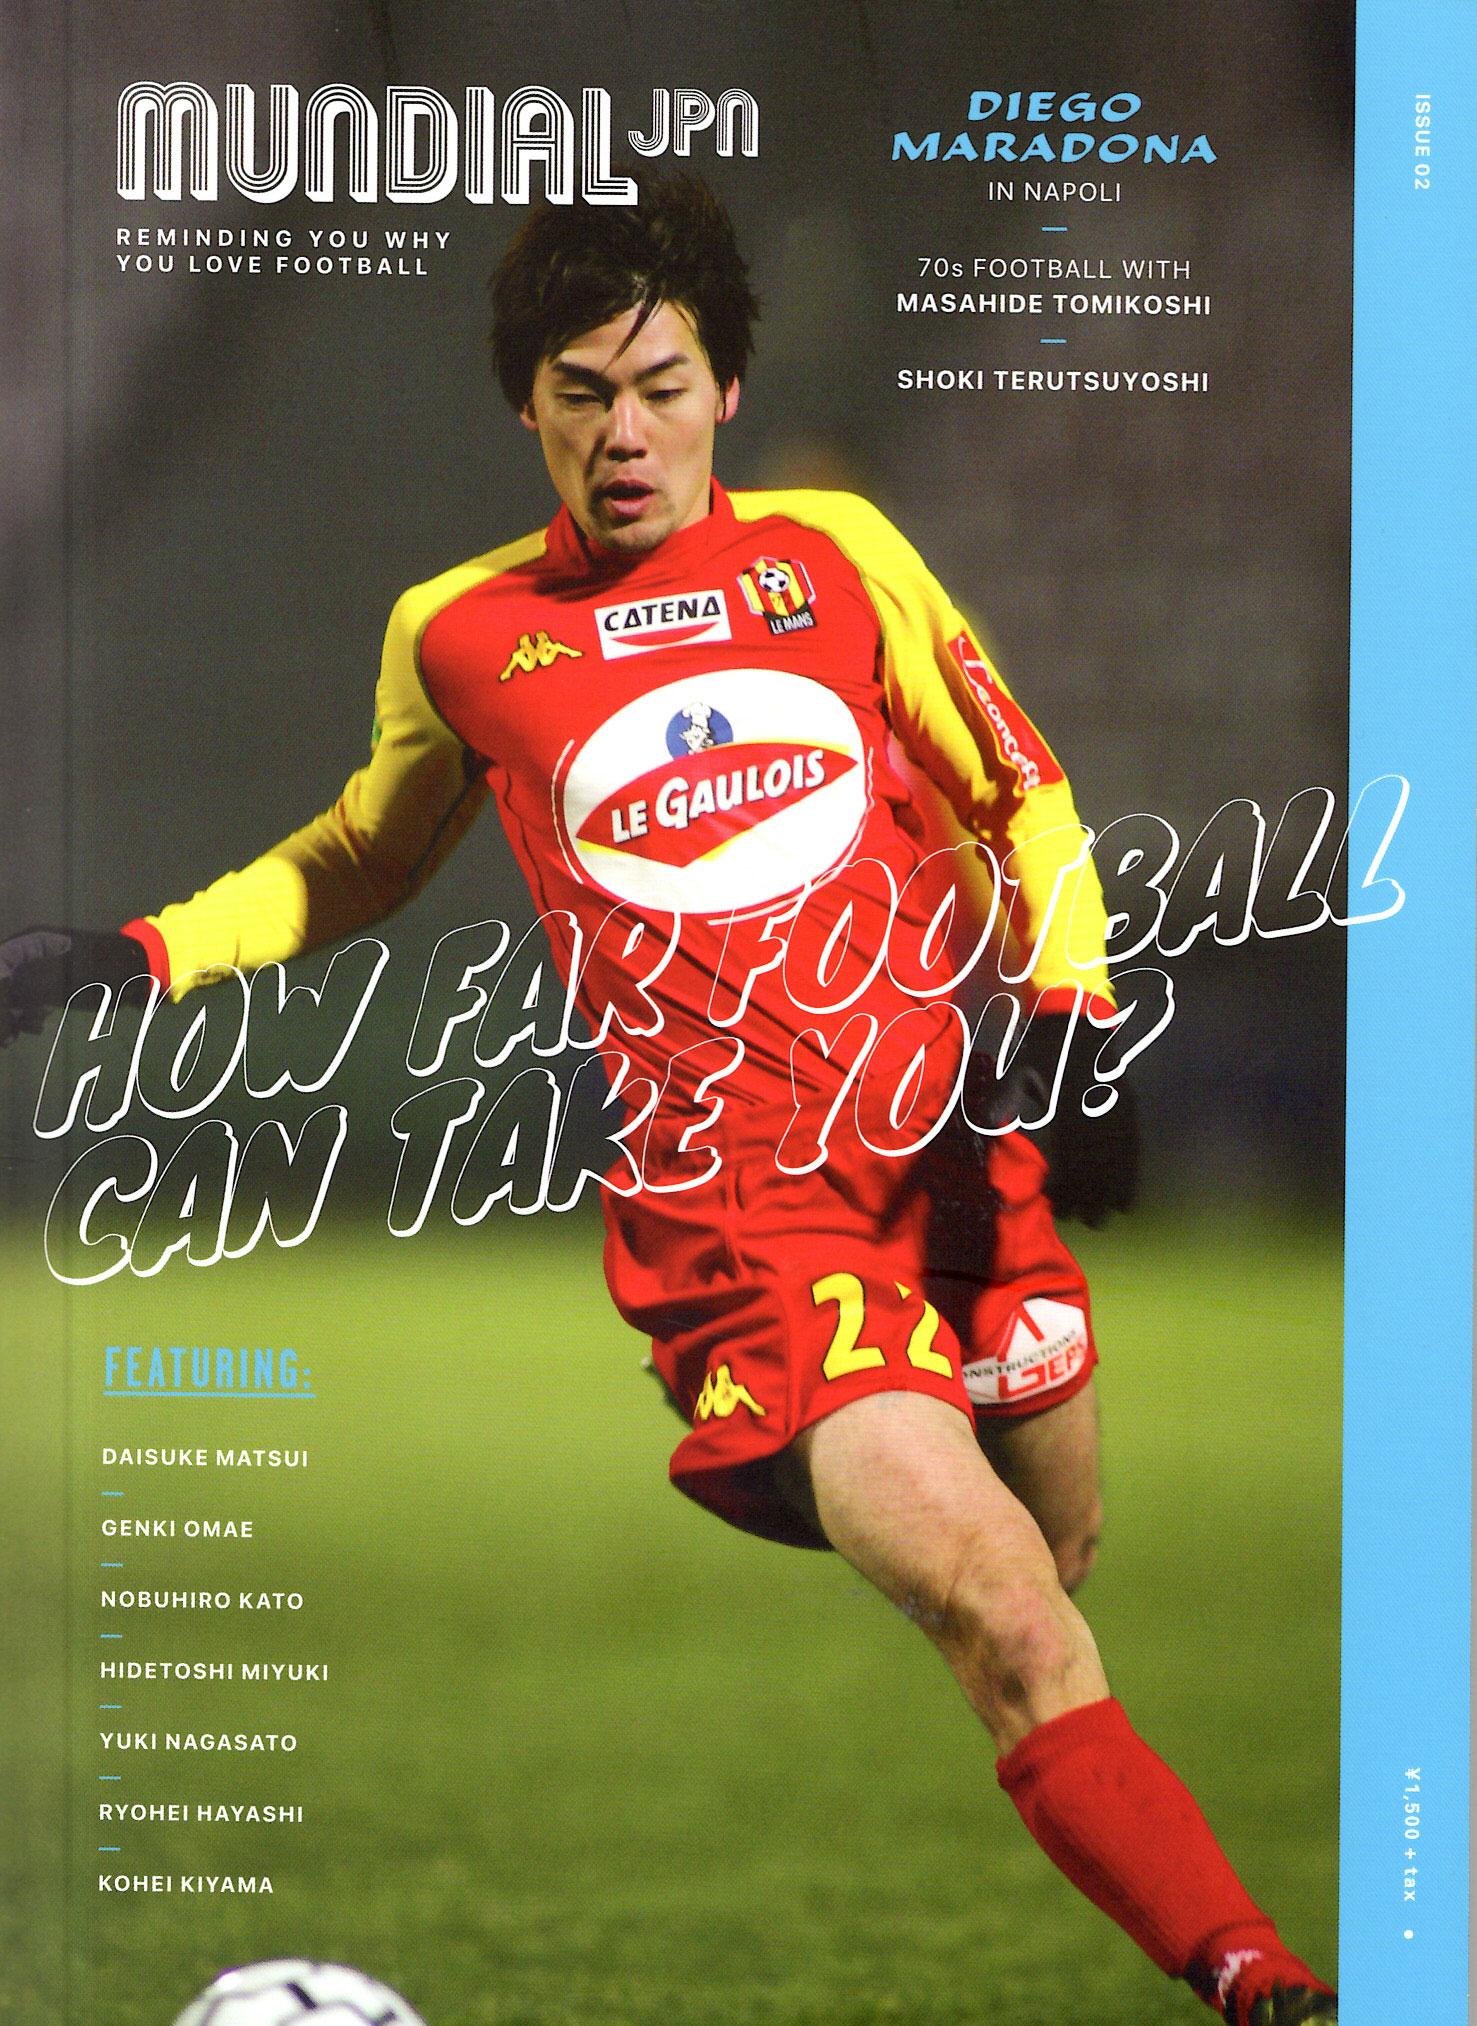 MUNDIALJPN_ISSUE#2